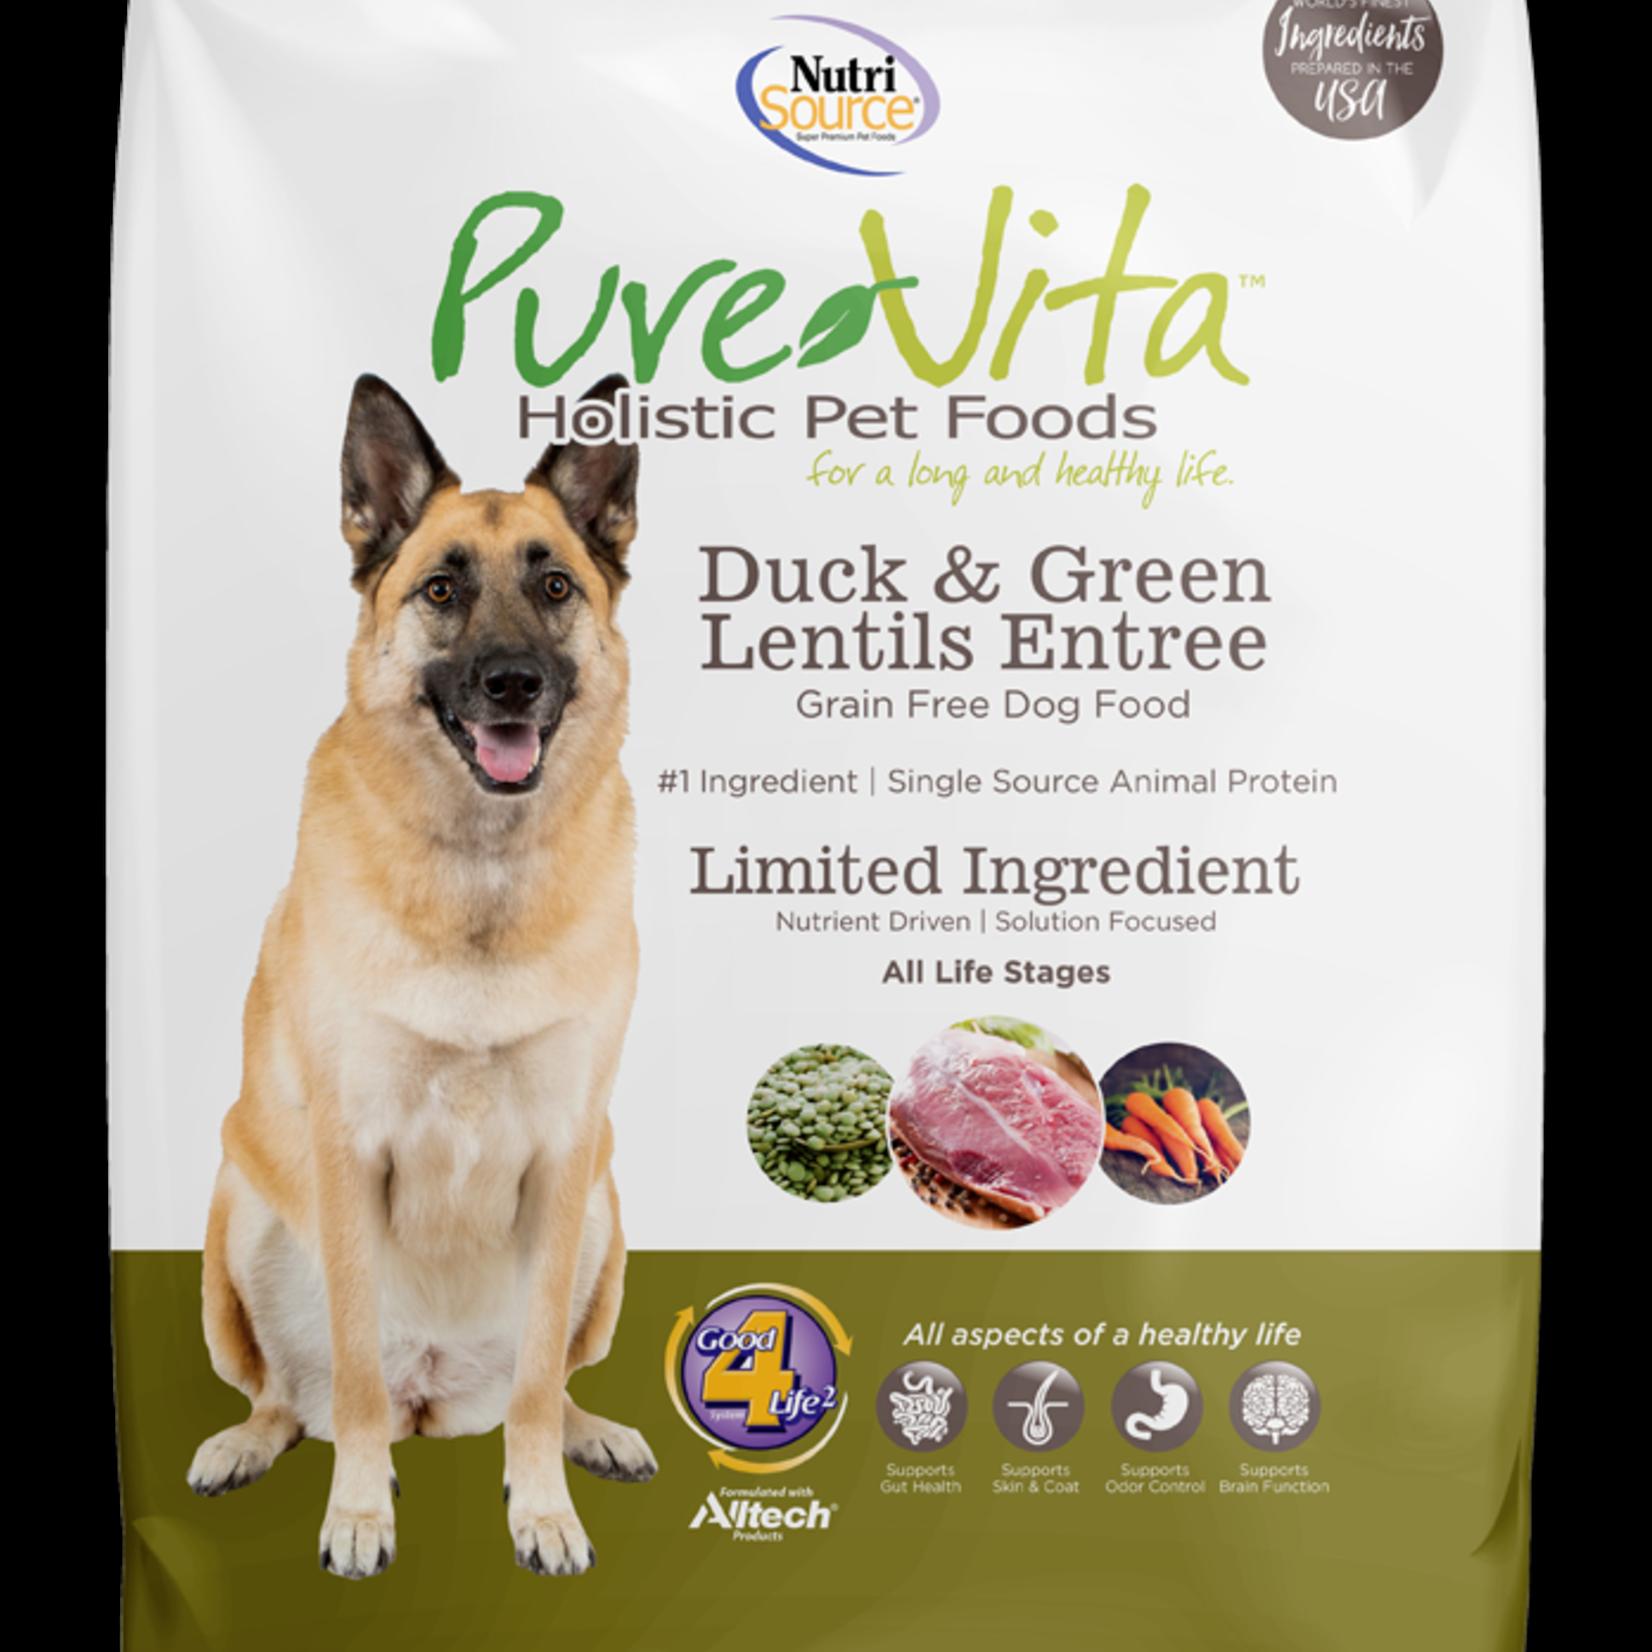 PureVita Pure Vita Dog GF Duck & Green Lentils 15#